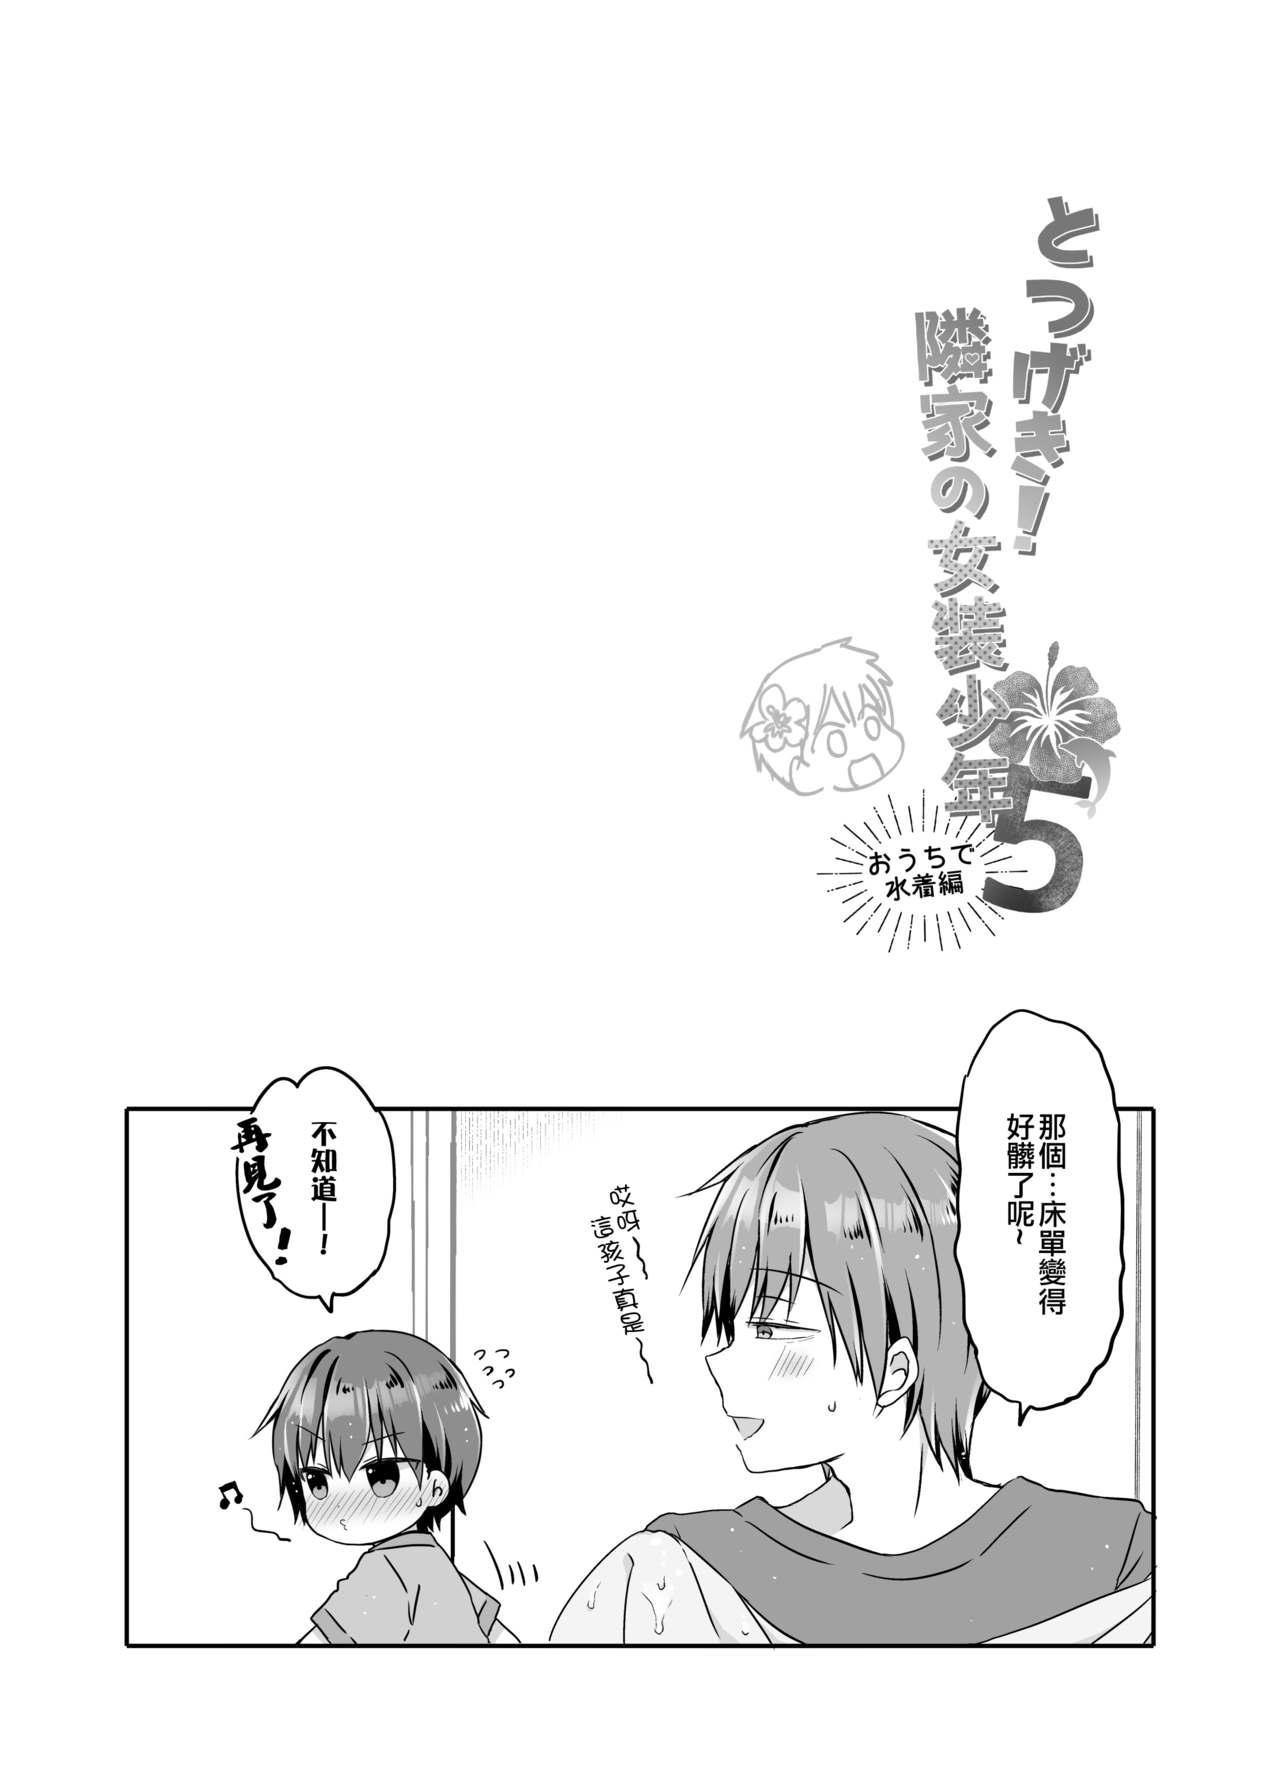 Totsugeki! Rinka no Josou Shounen 5 Ouchi de Mizugi Hen 13